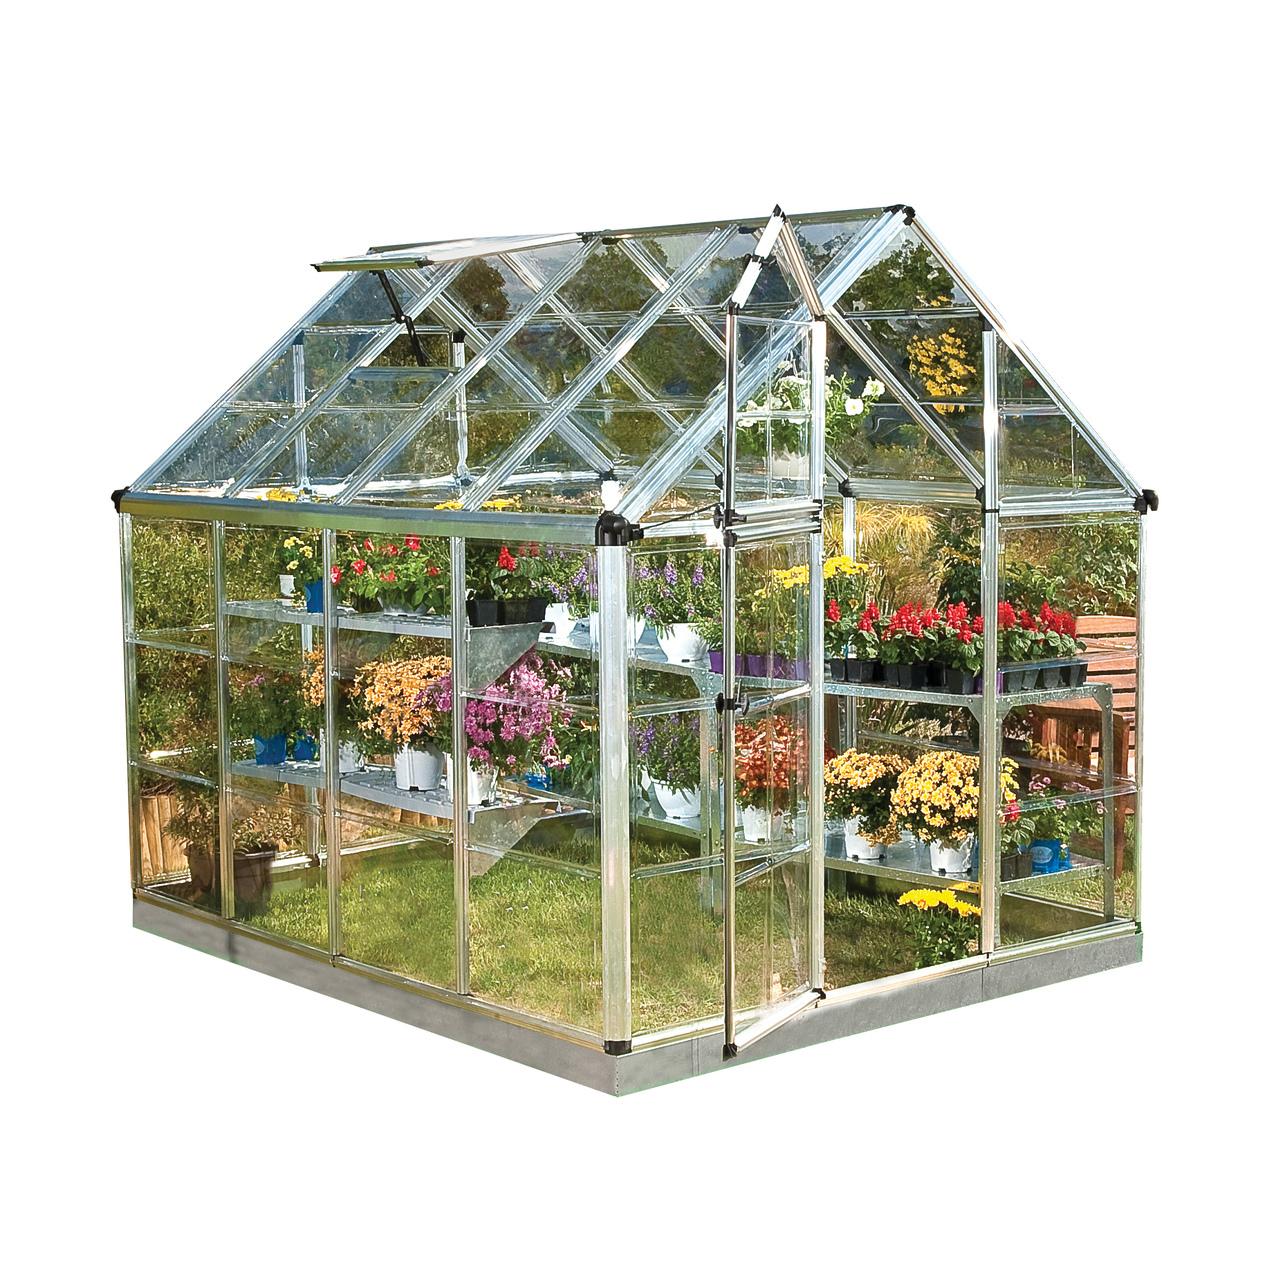 Palram Snap & Grow 6' X 8' Hobby Greenhouse, Silver